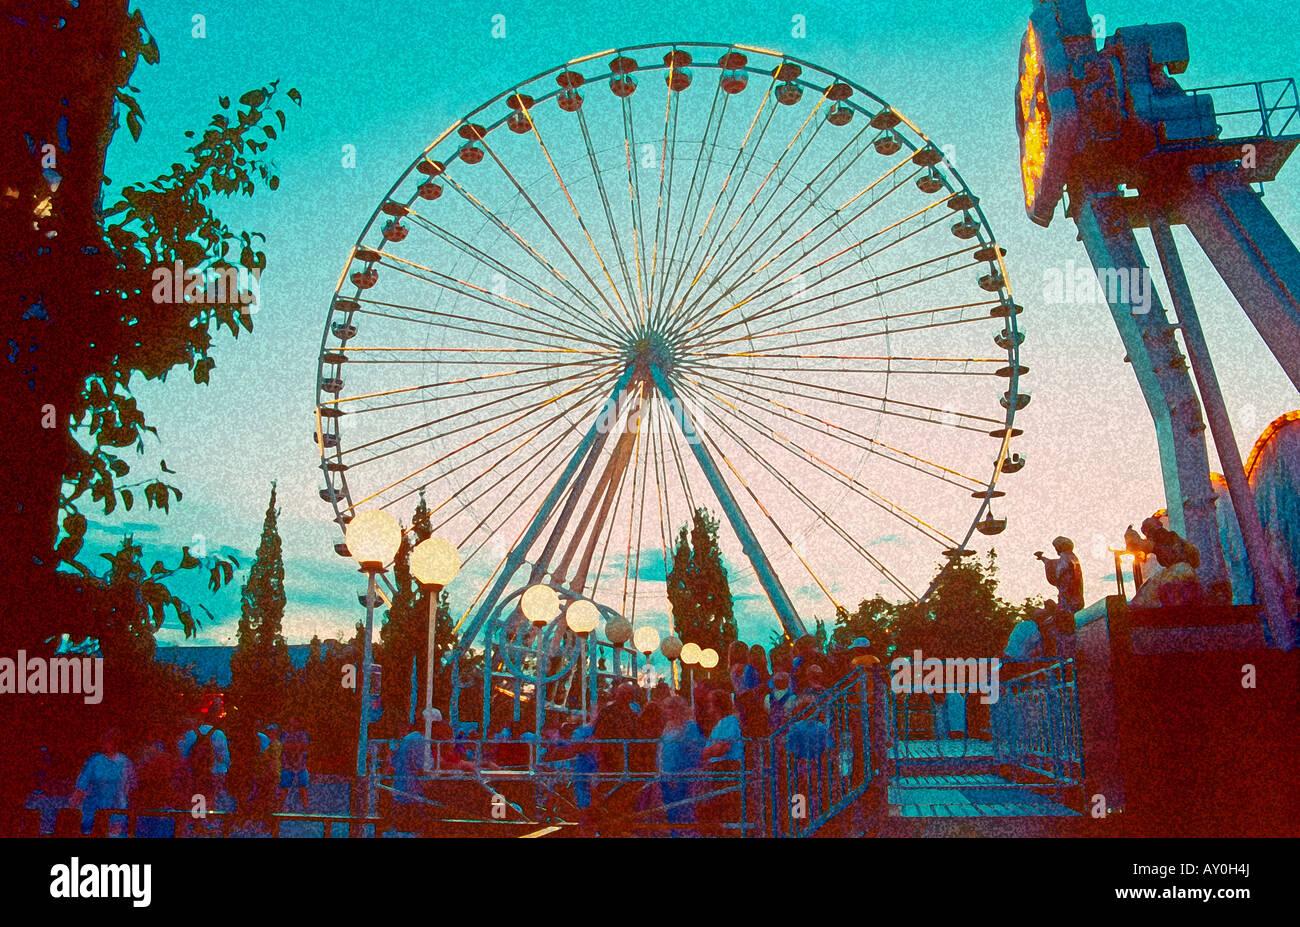 Amusement Park Rides At Lagoon In Farmington, Utah, Usa. Digital ...